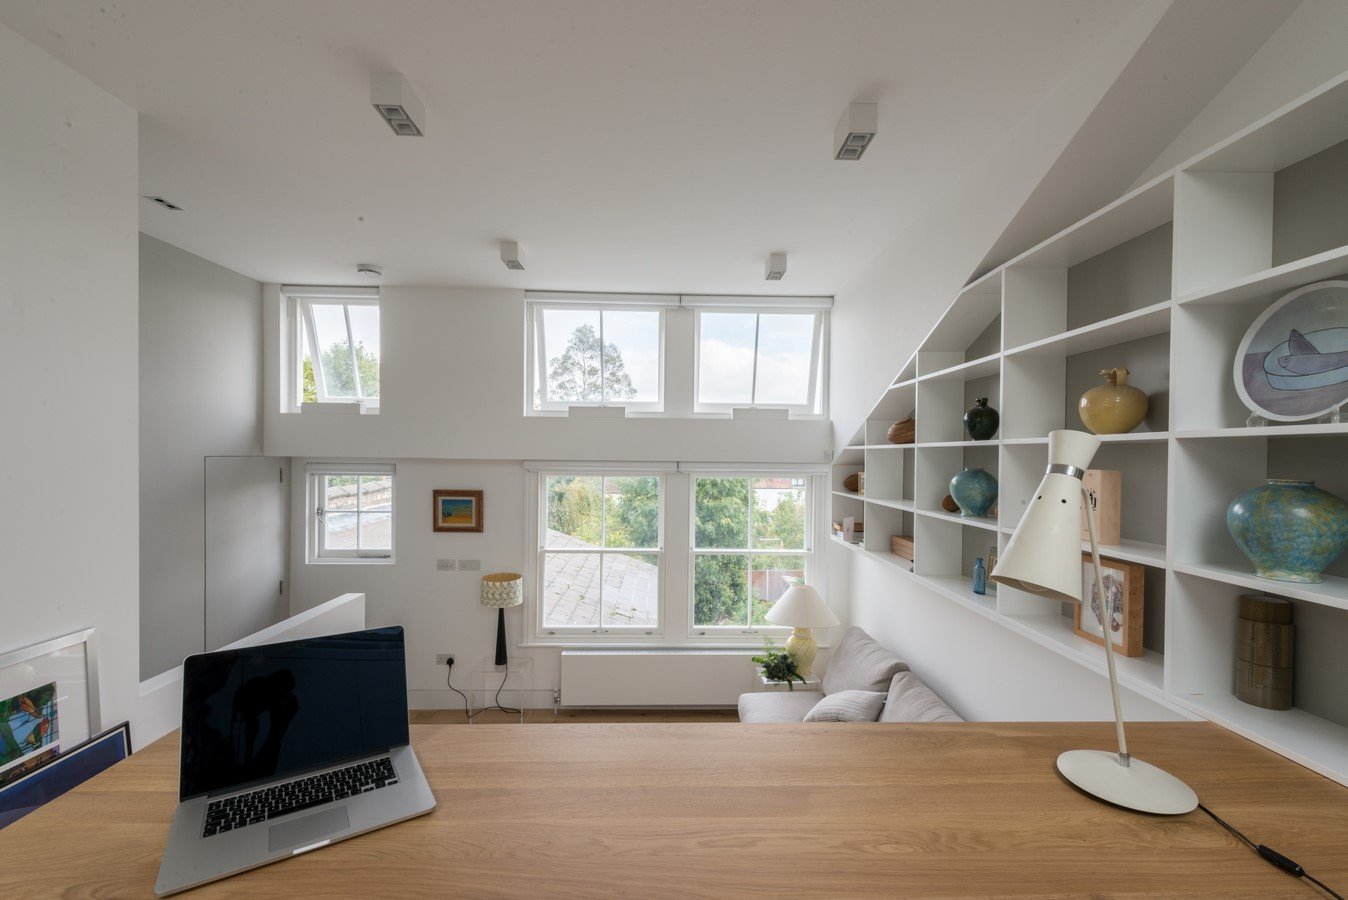 5105 Rosebery House by Paul Archer Design: Sheet 1